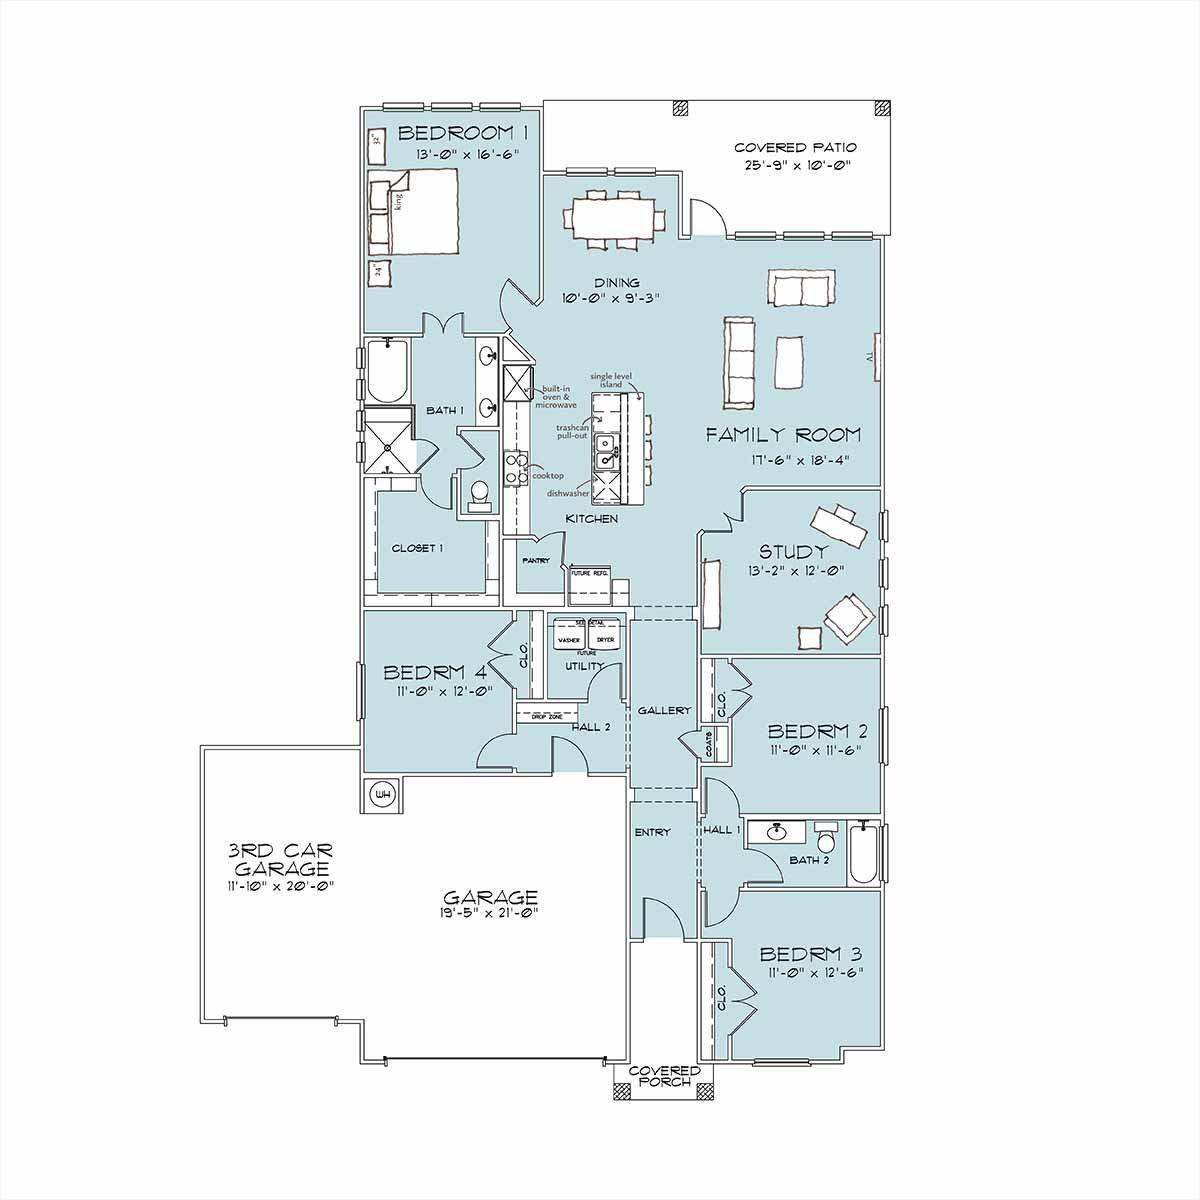 barton floor plan with 3rd car garage